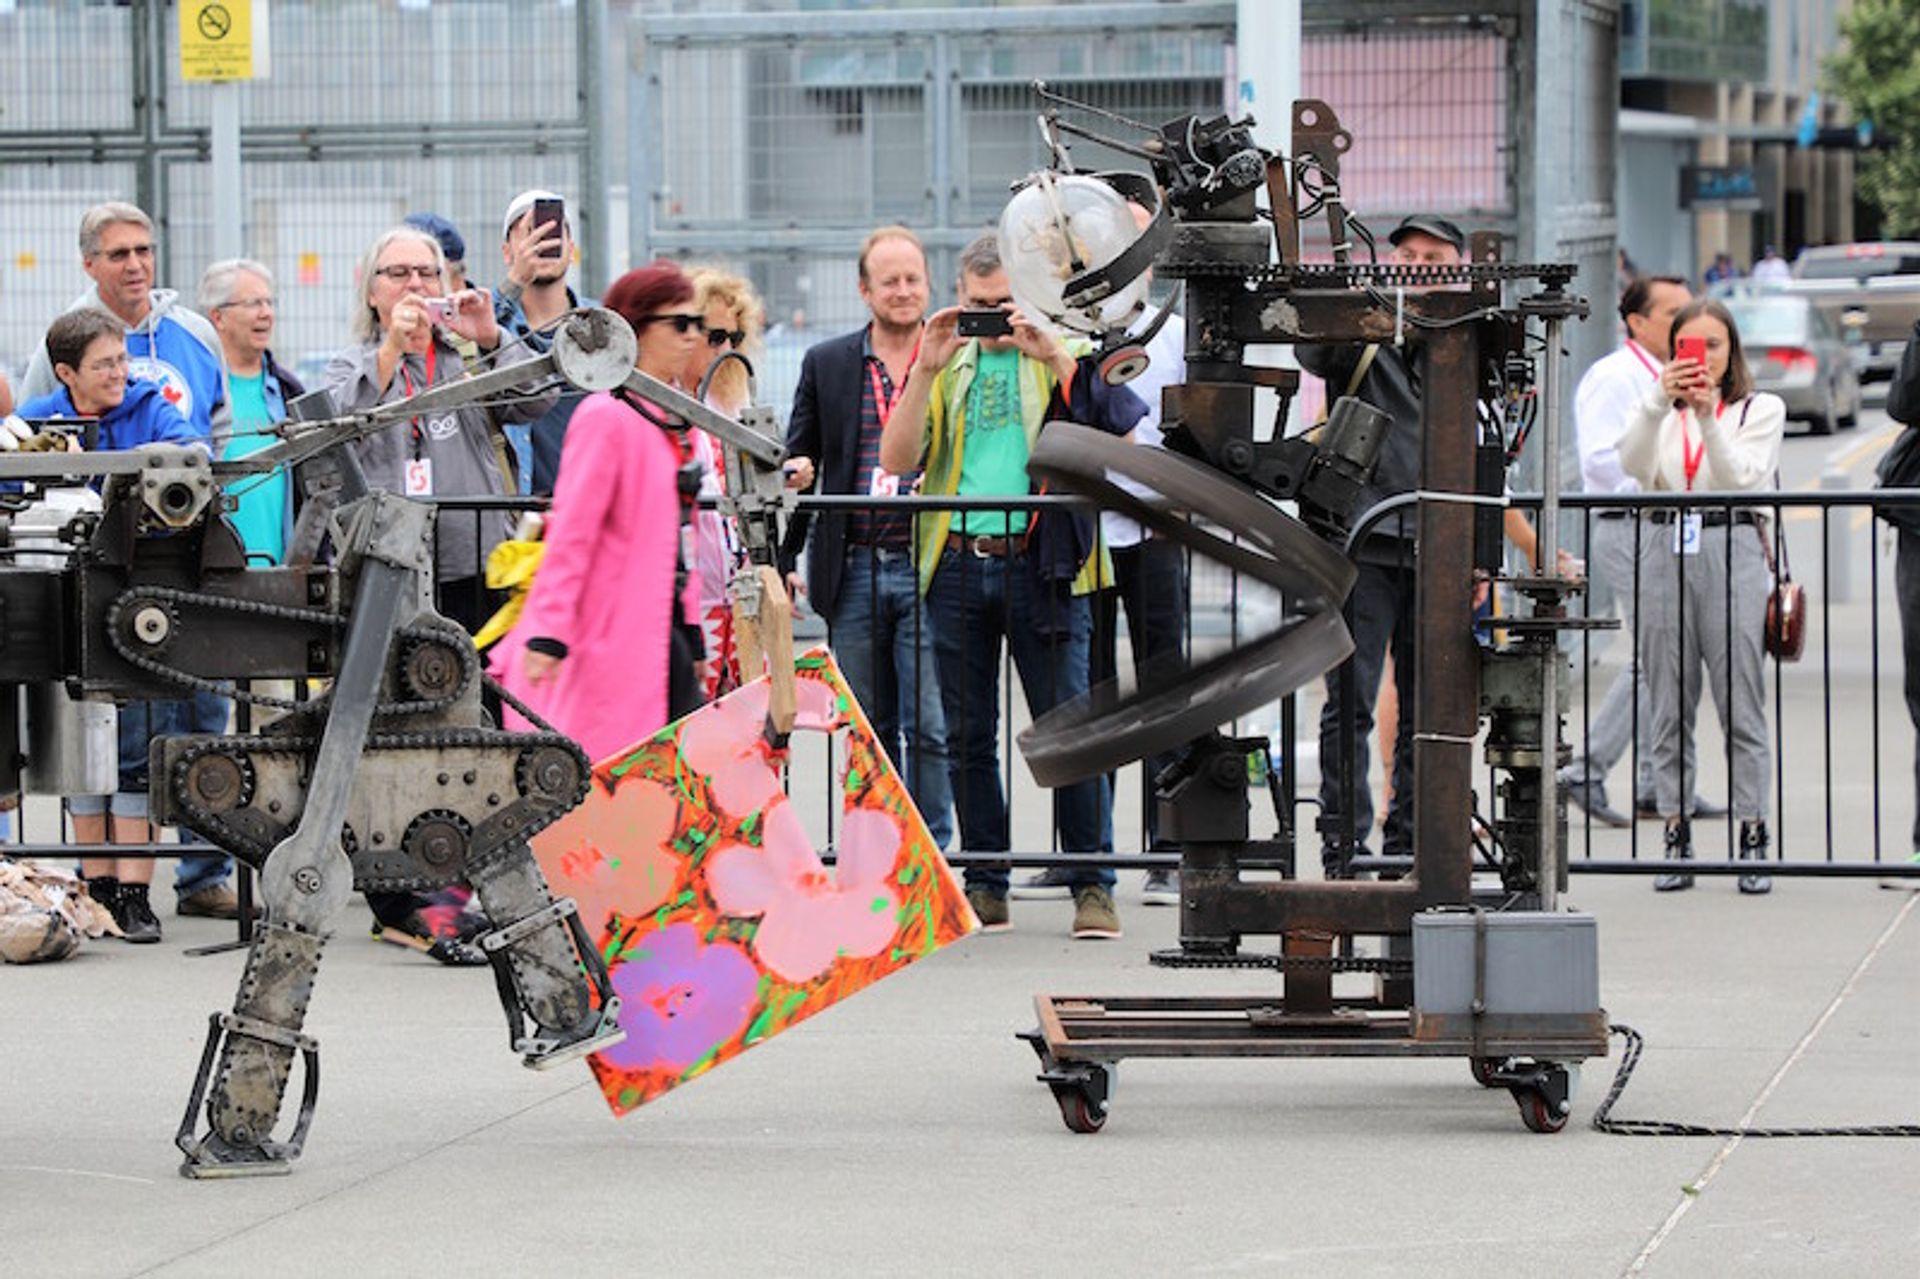 Mark Pauline's robots trashing an Andy Warhol replica at the Seattle Art Fair Courtesy of the Seattle Art Fair